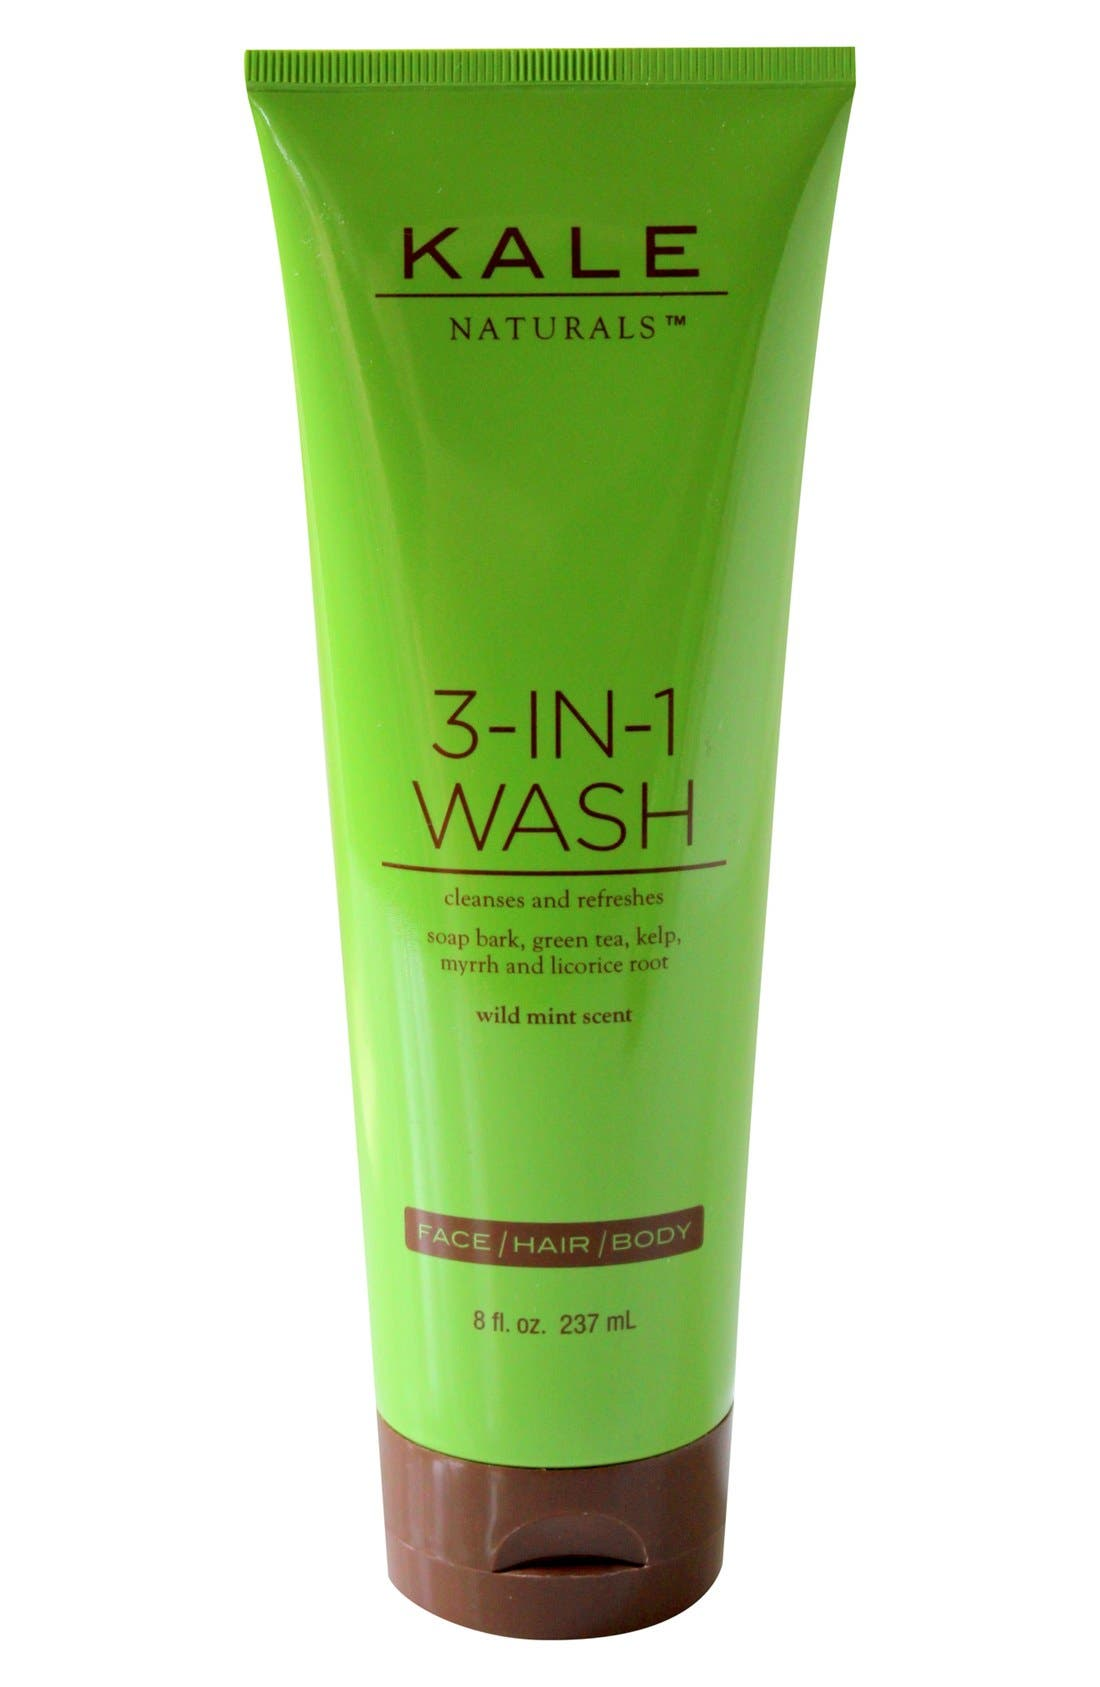 Kale Naturals® 3-in-1 Wash